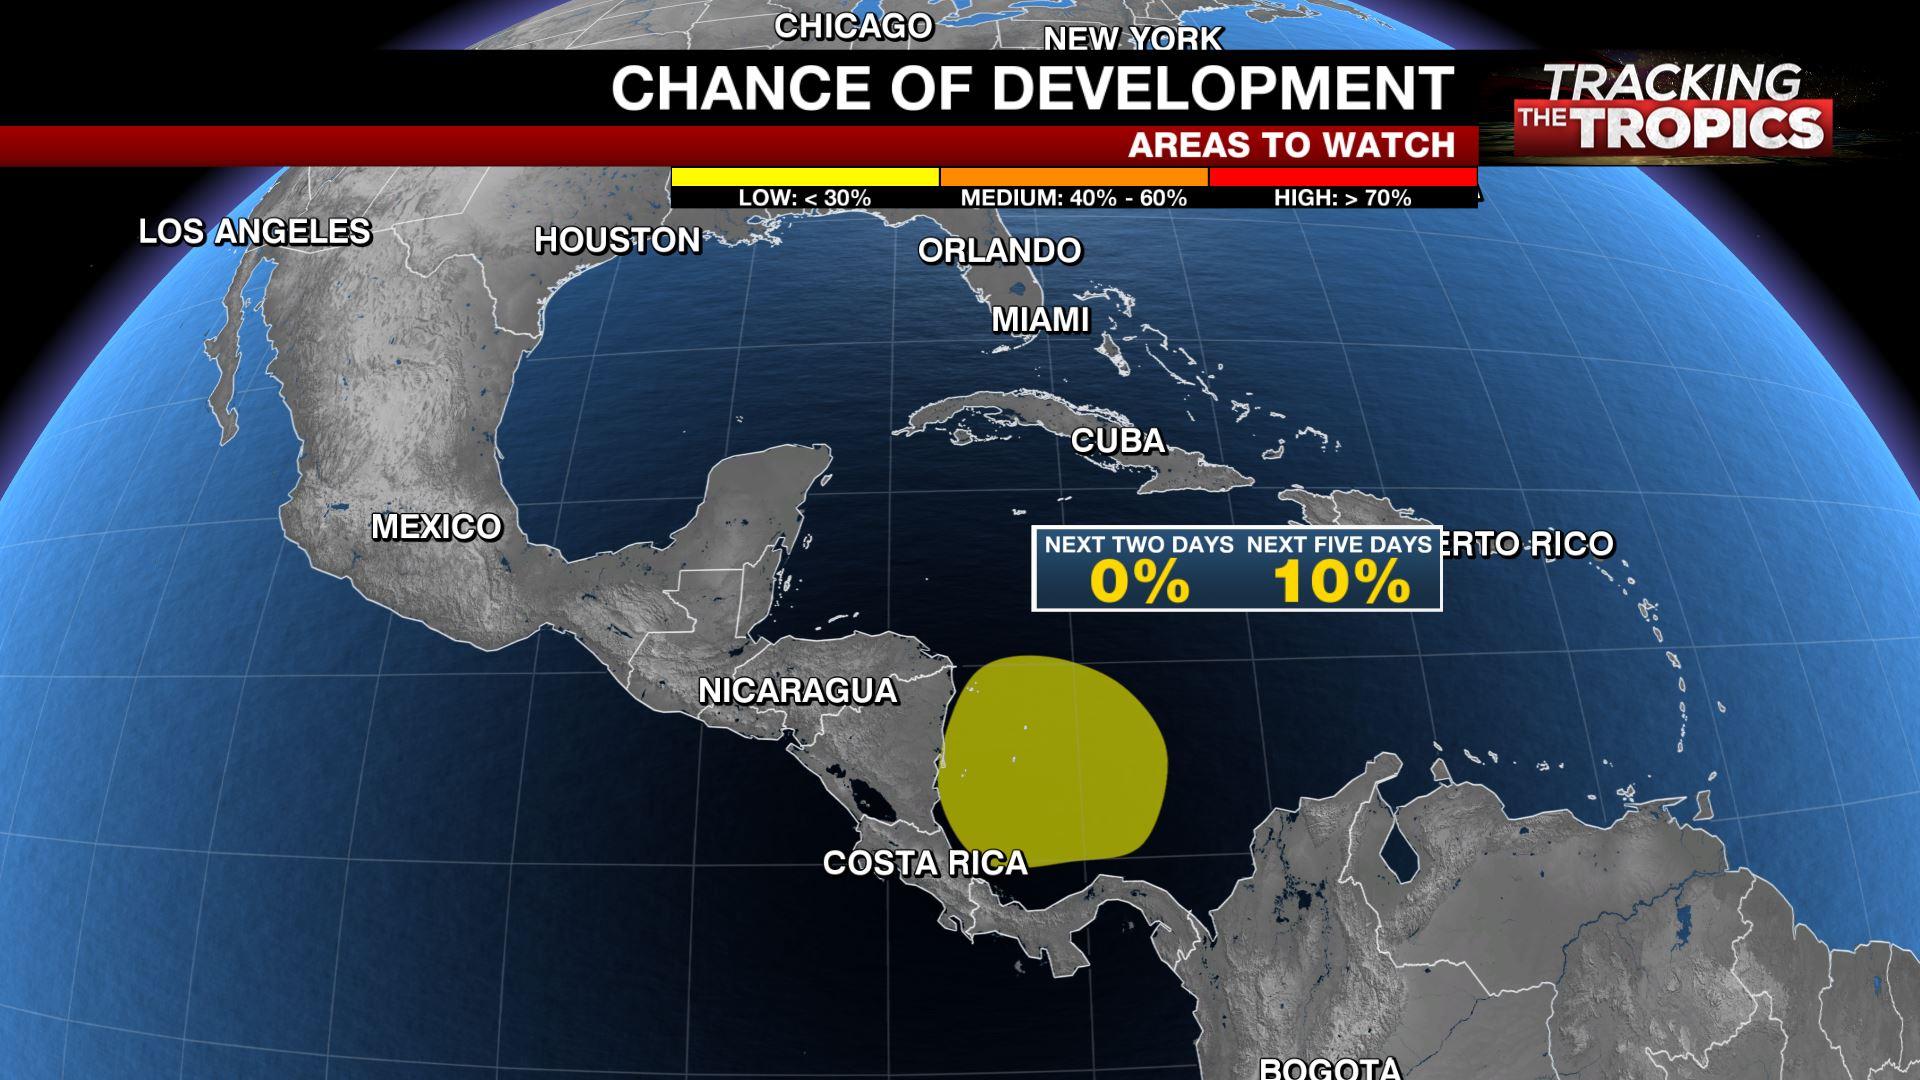 Tracking the Tropics: How accurate are hurricane season forecasts?